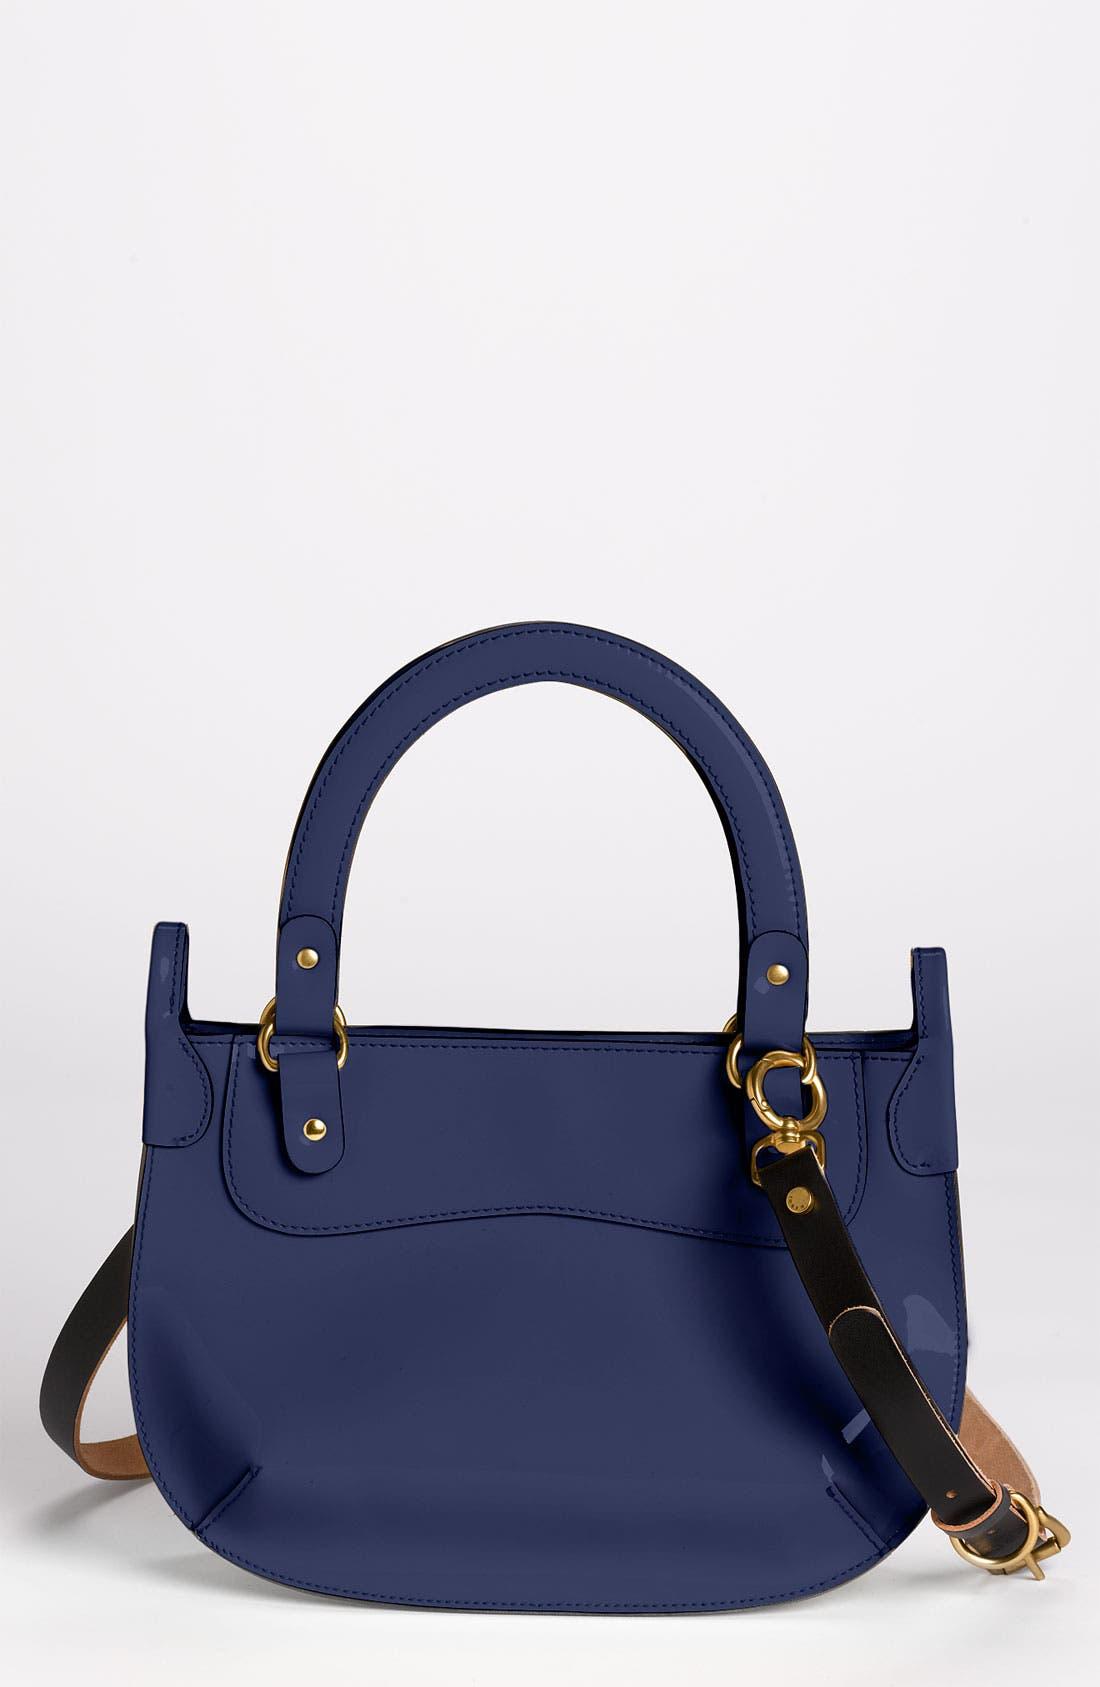 Main Image - Marni 'Small' Patent Leather Crossbody Bag